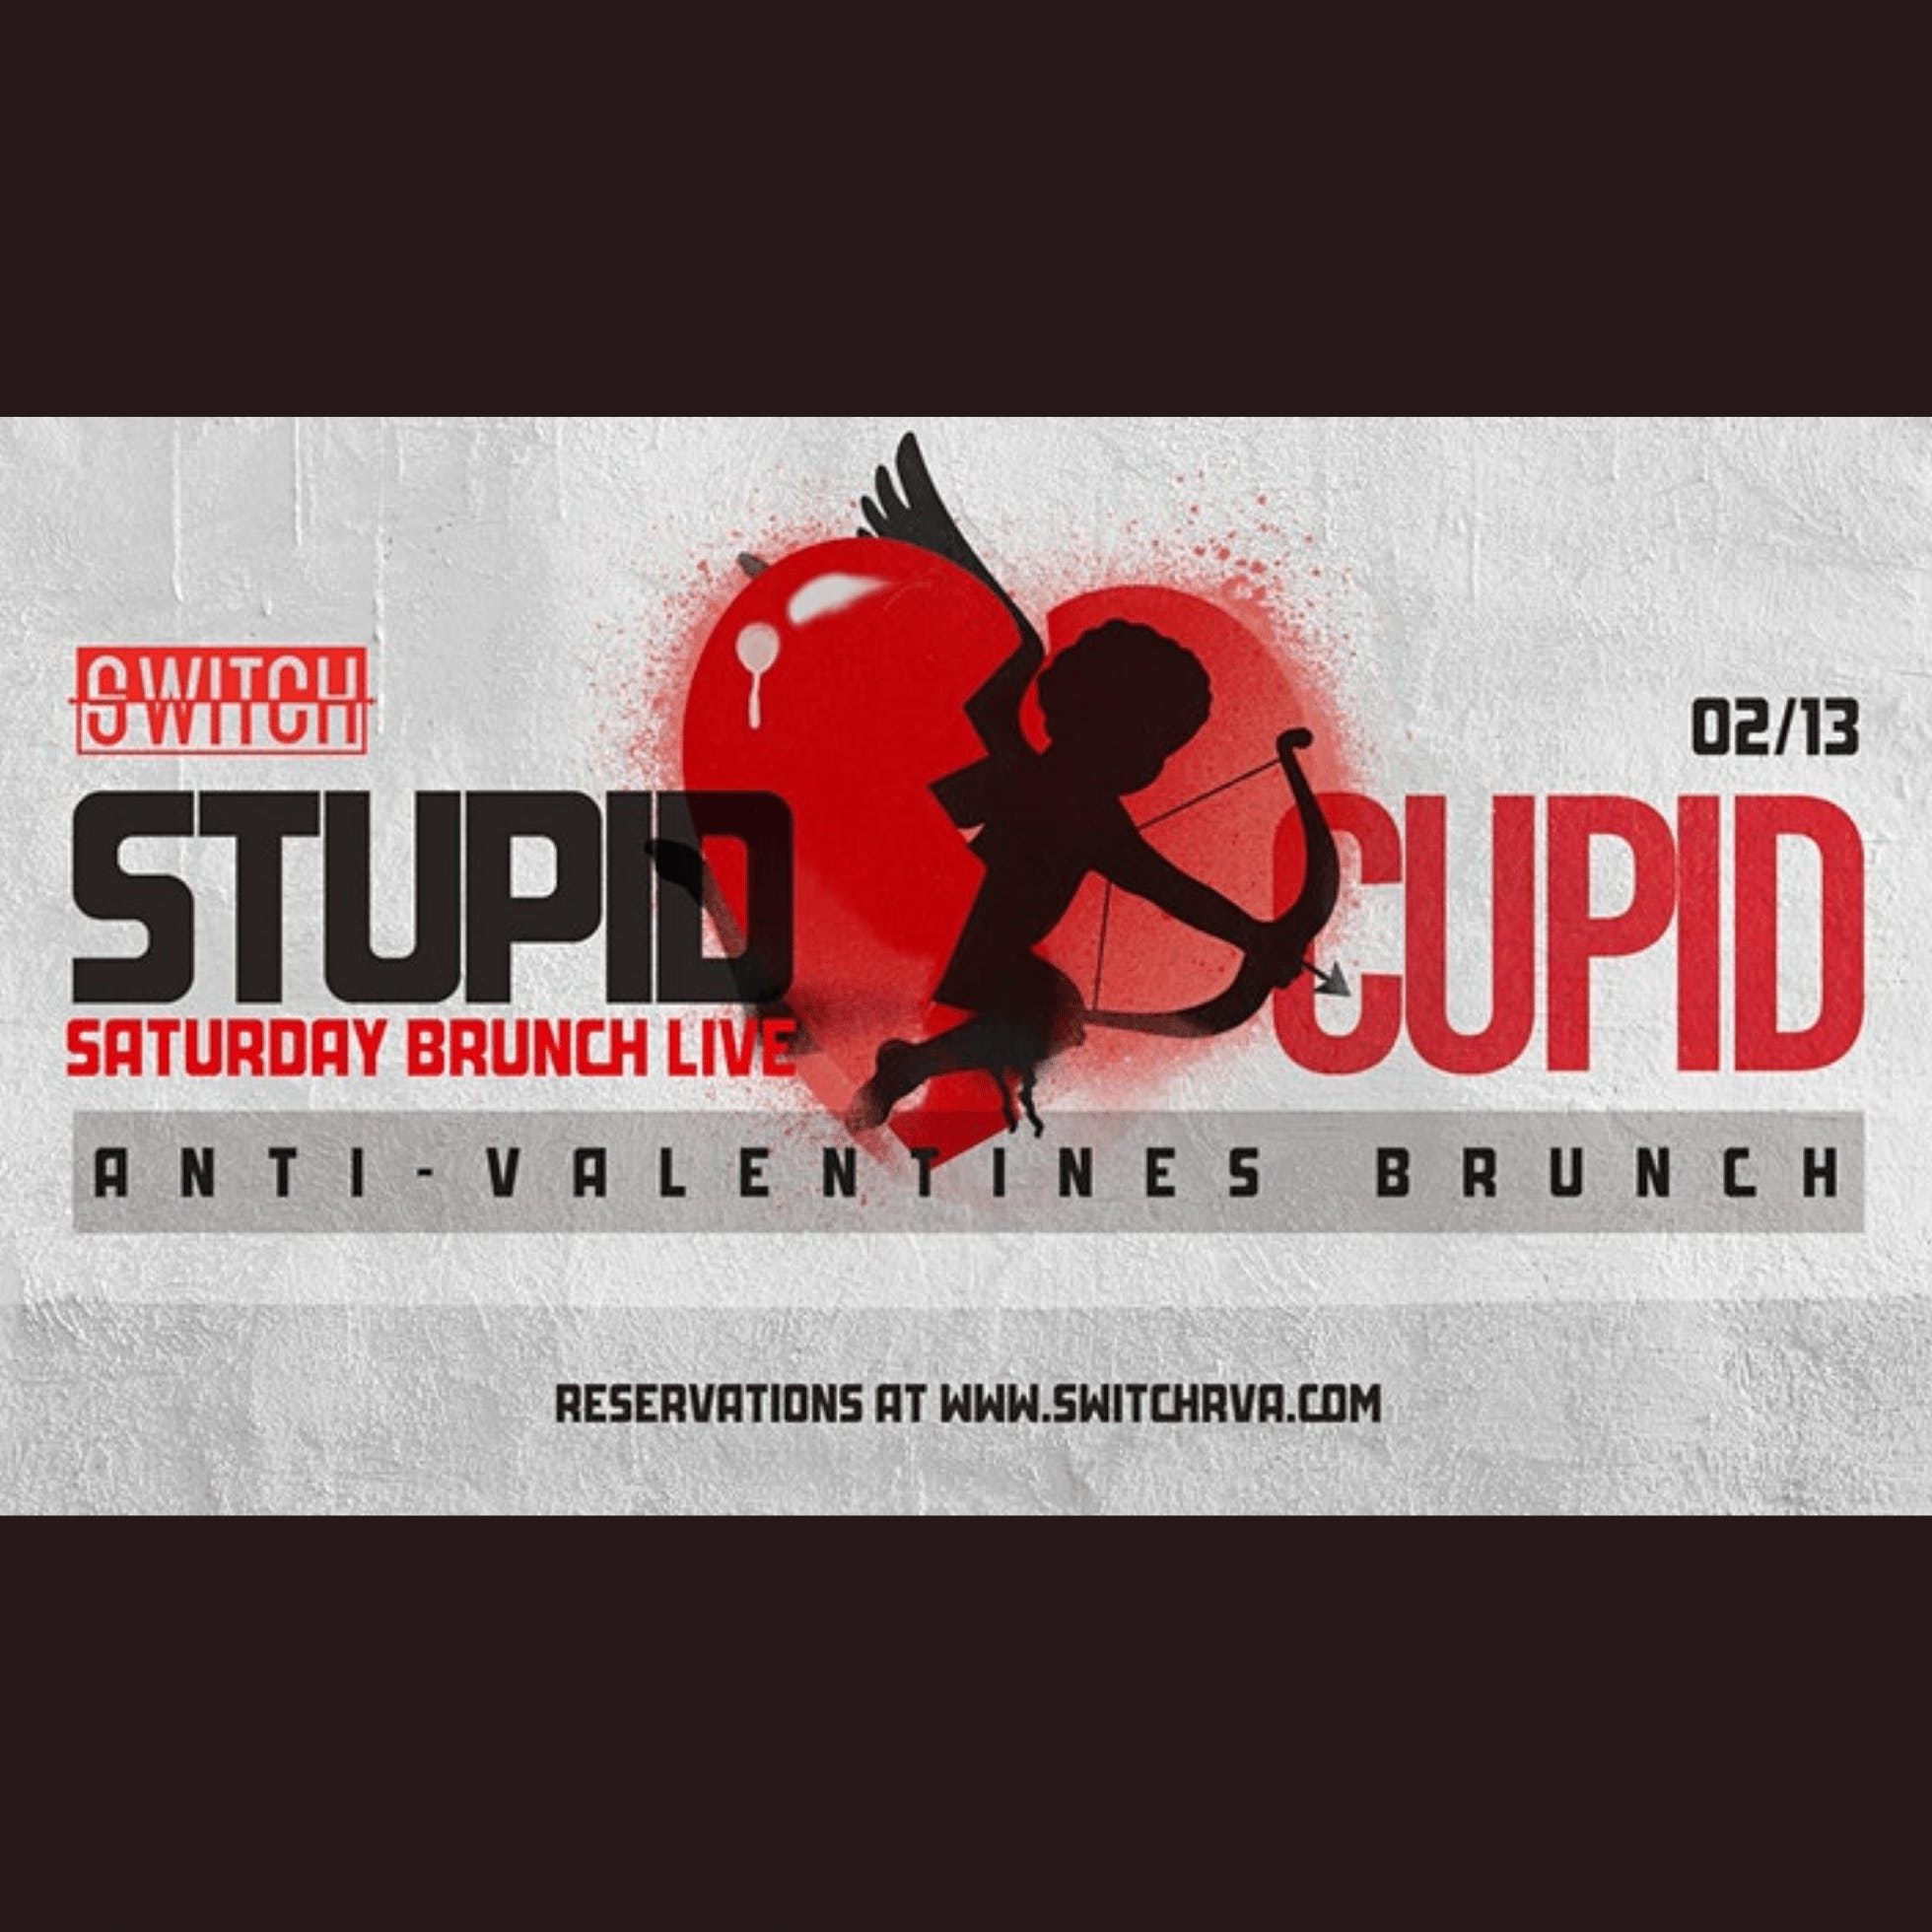 Stupid Cupid Brunch